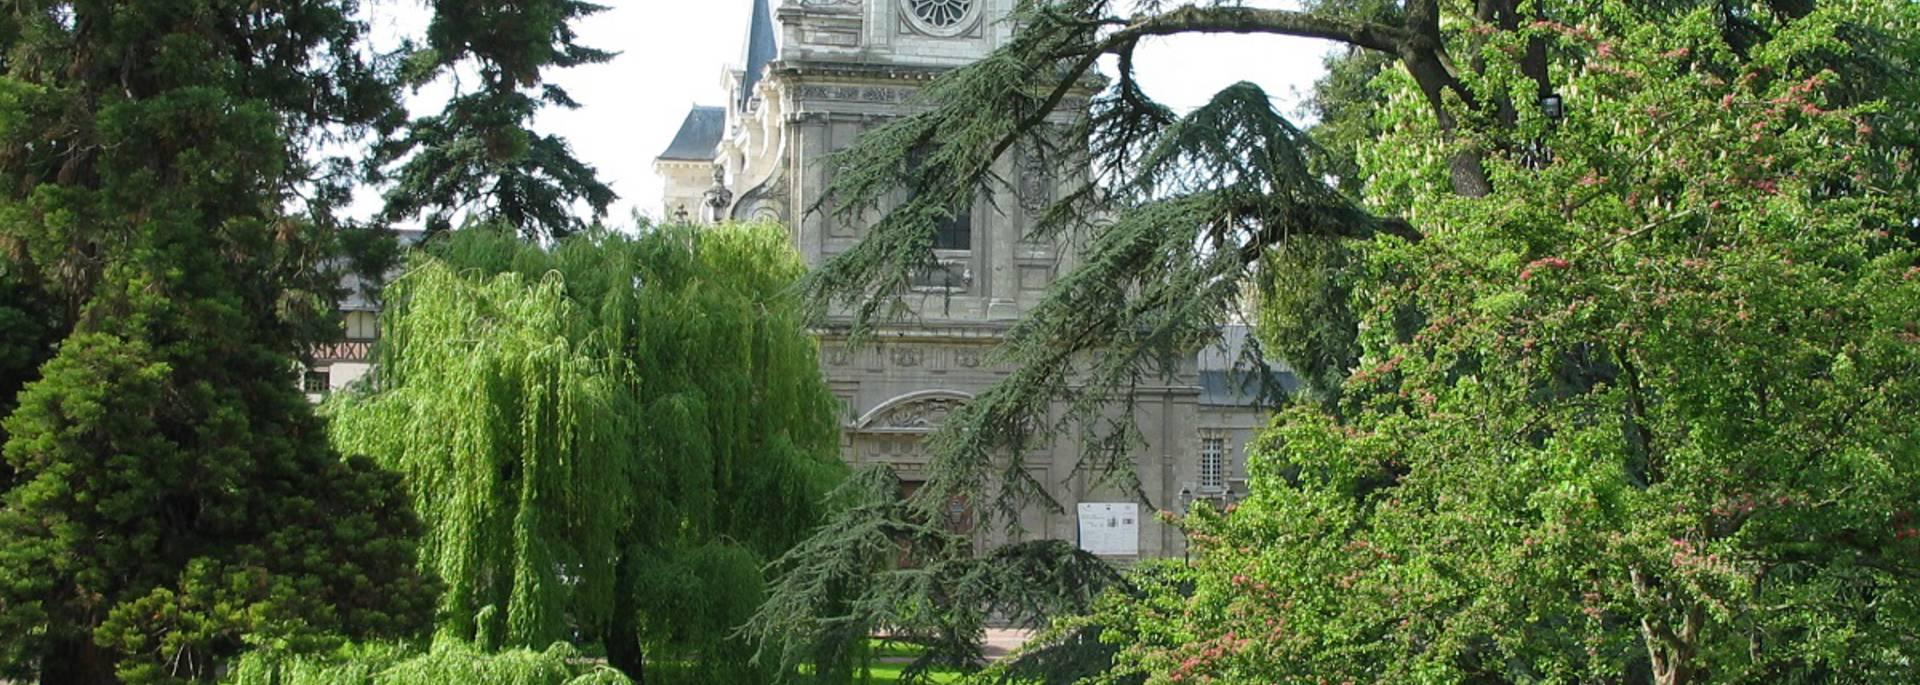 The Augustin Thierry garden in Blois